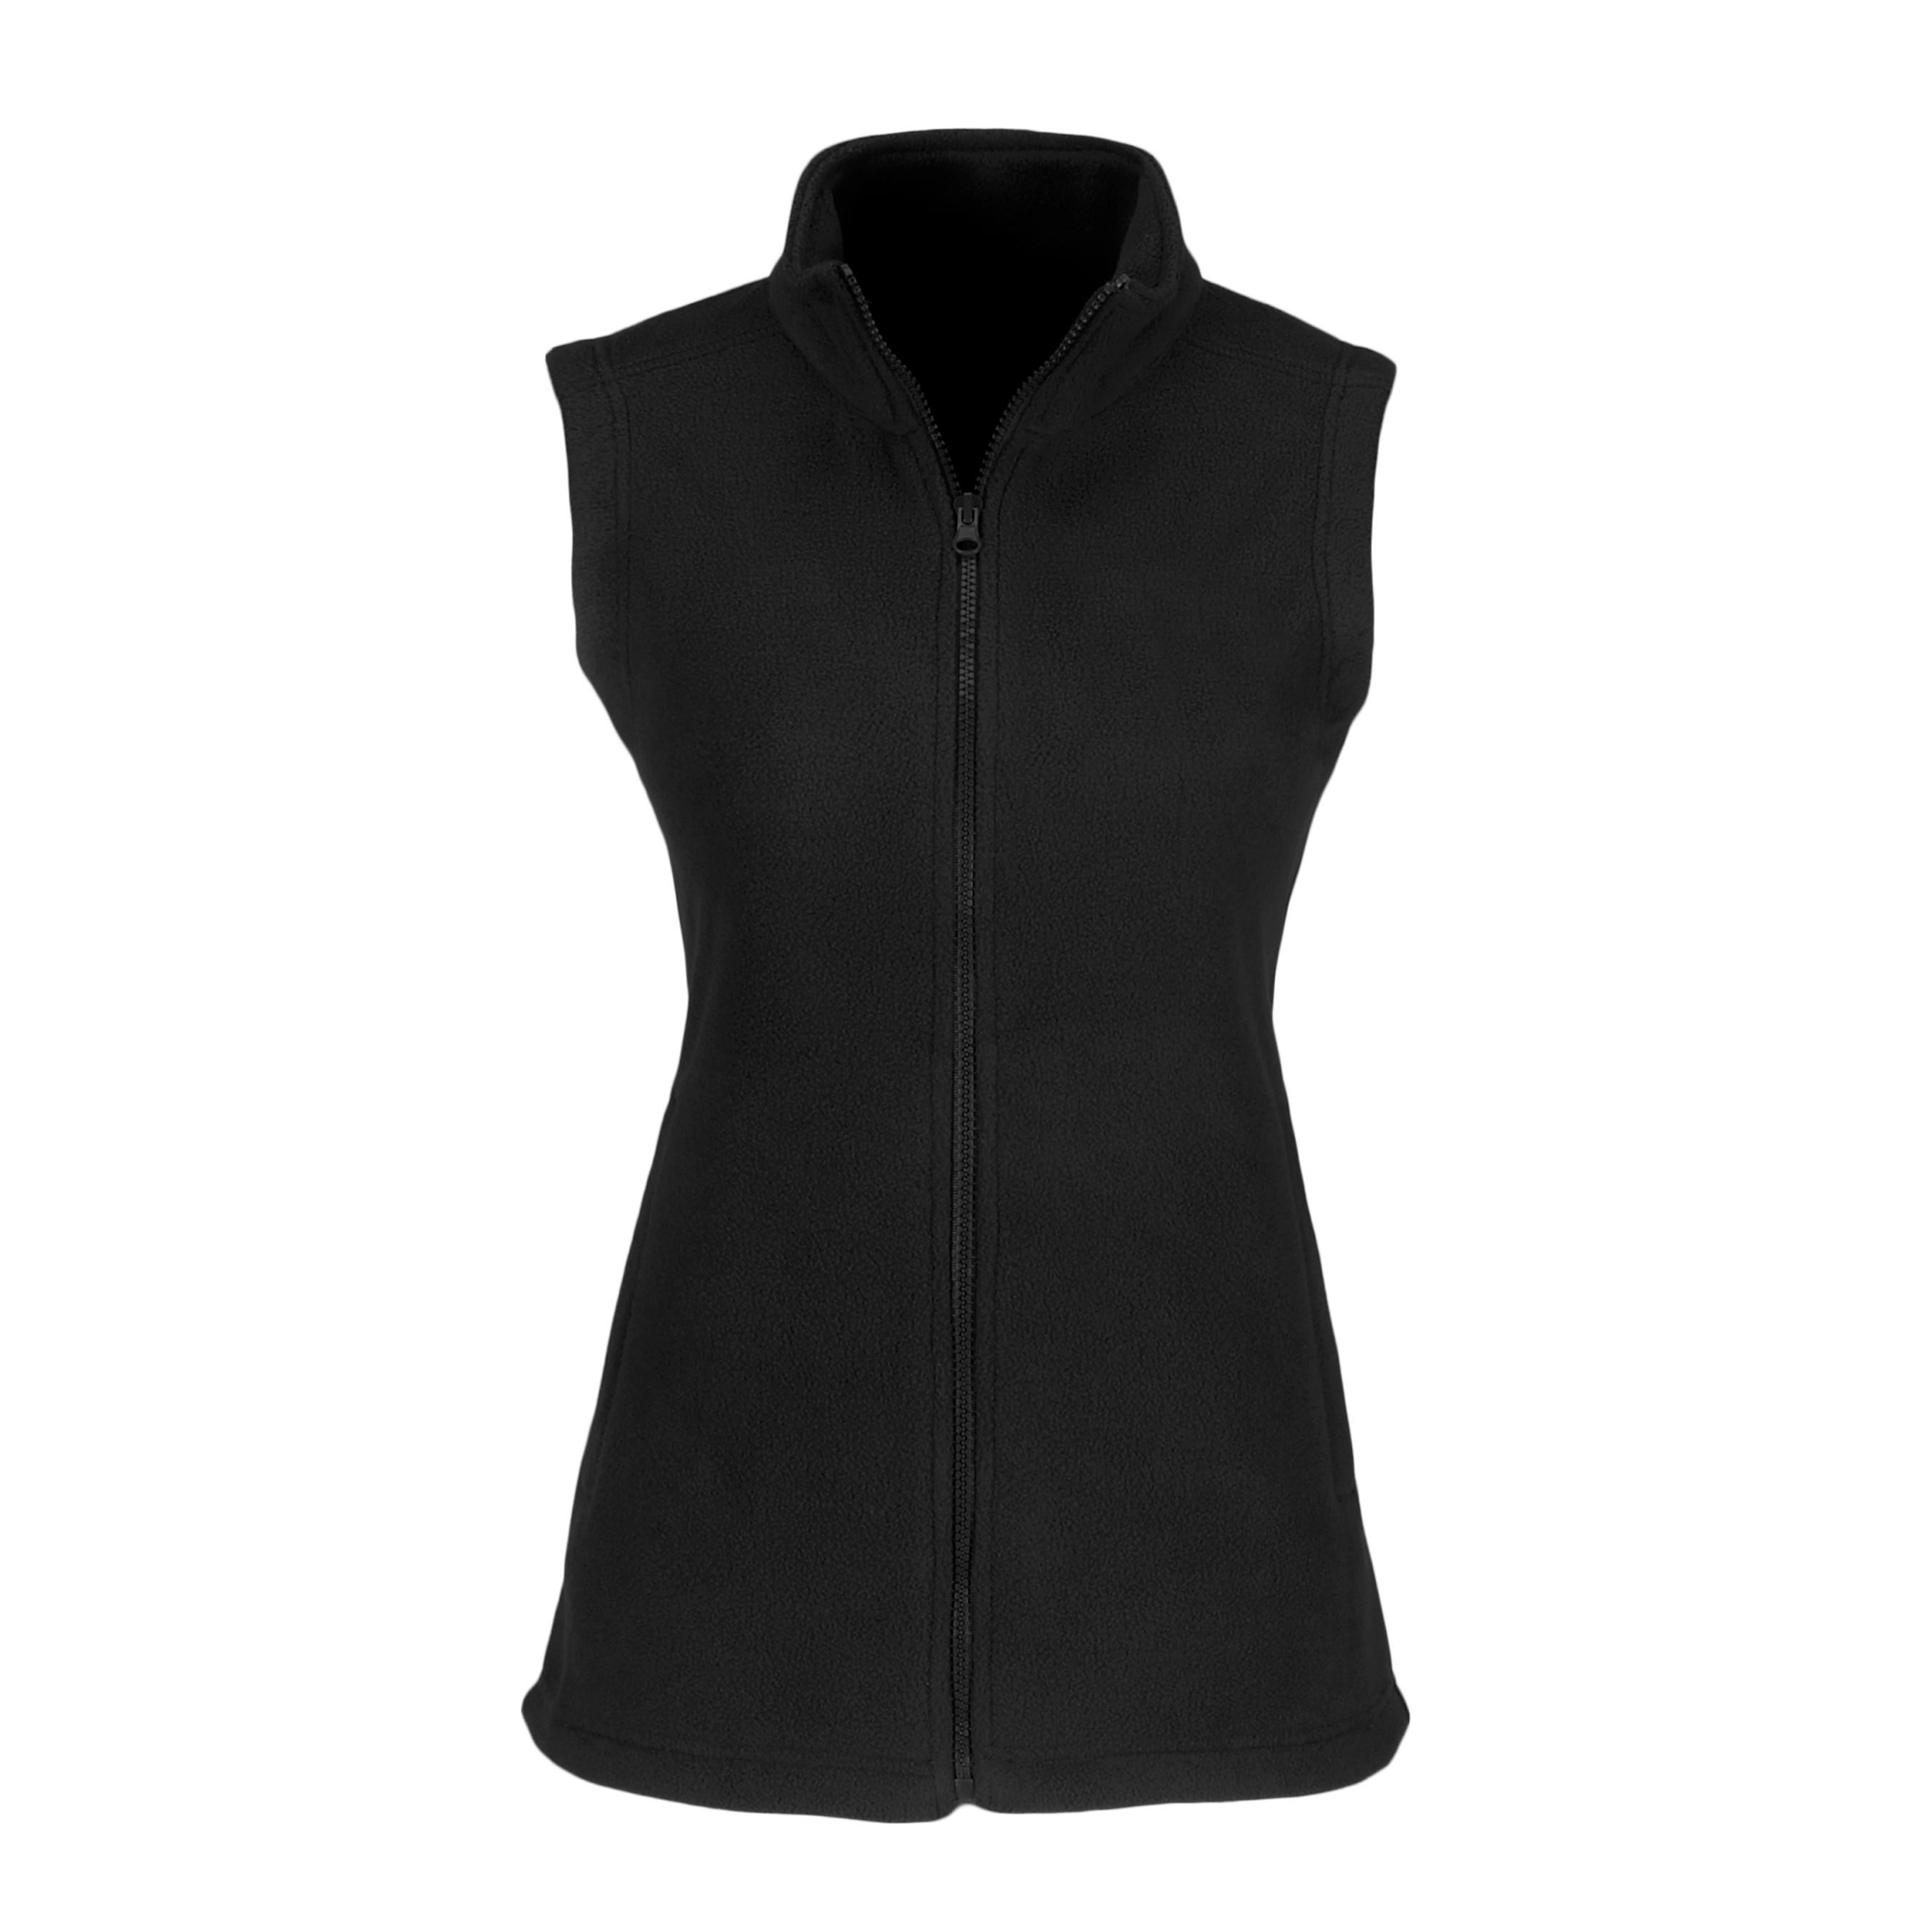 Ladies Yukon Micro Fleece Bodywarmer - Black Only